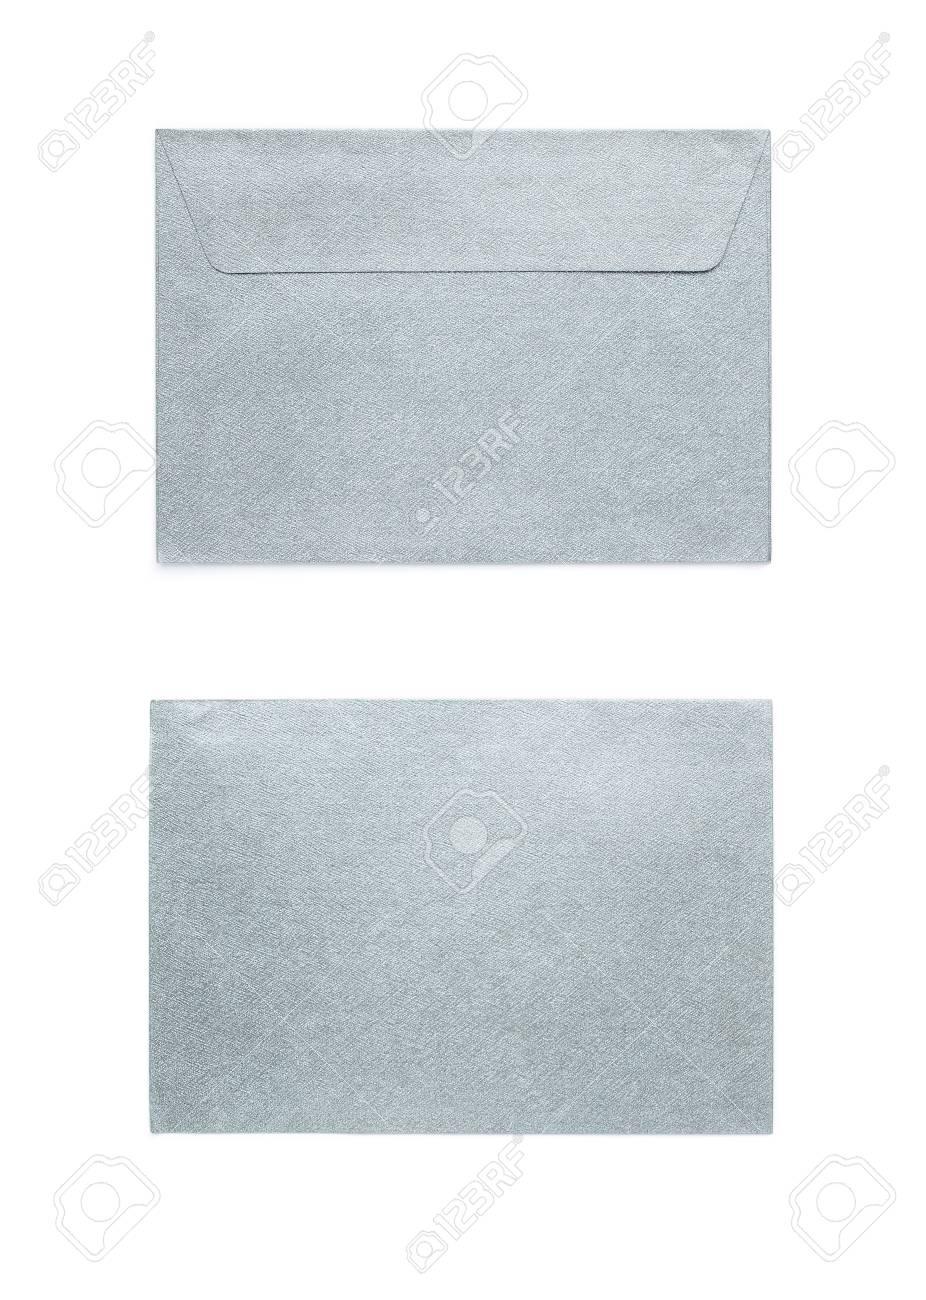 Blank Decorative Envelope Stock Photo - 12156499